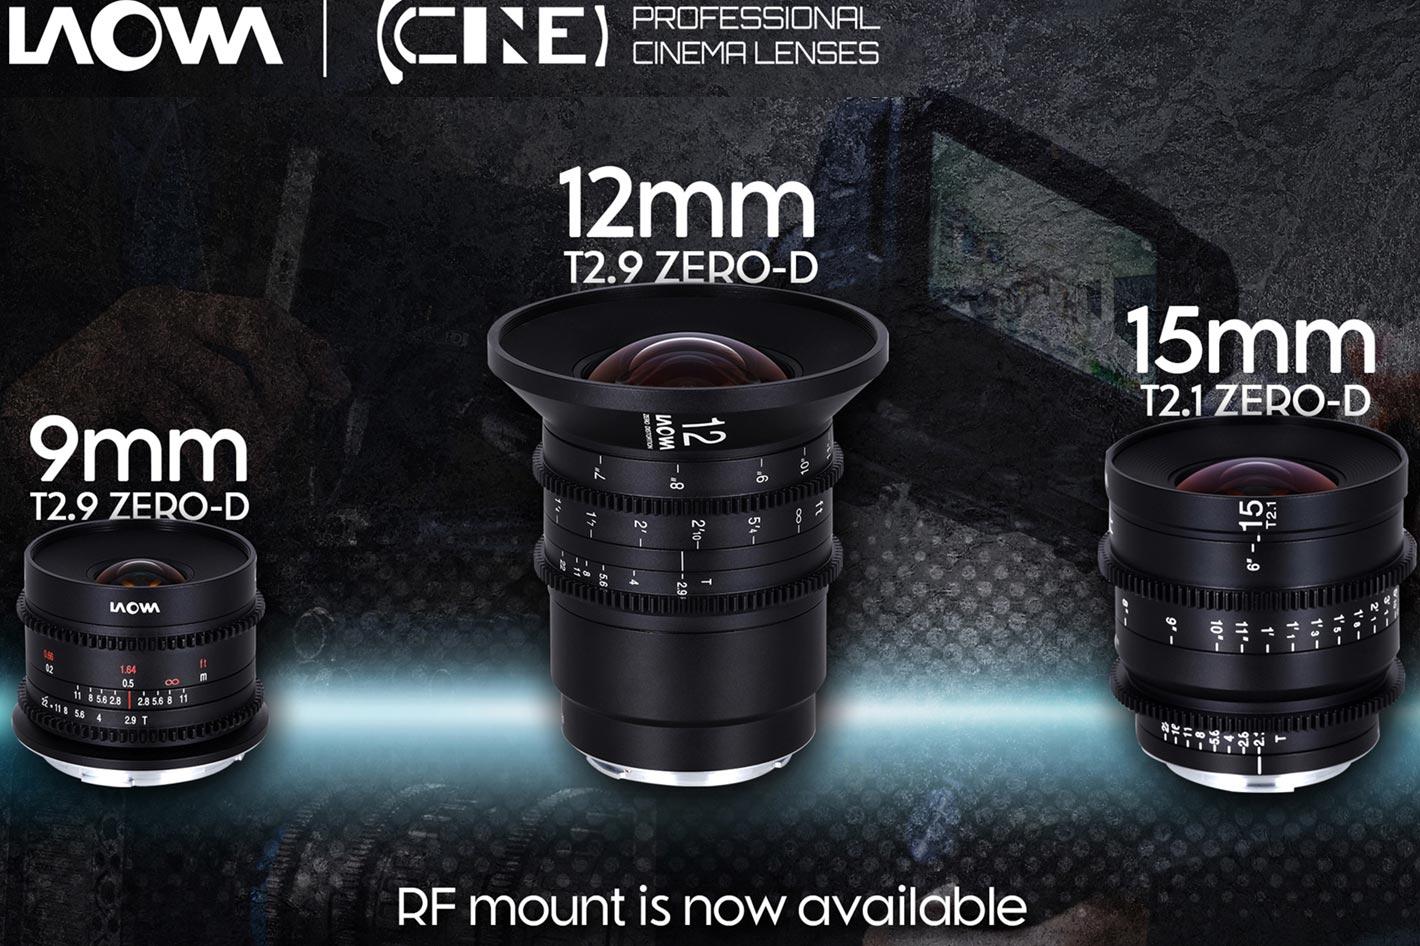 Three new Laowa cinema lenses for Canon RF mount